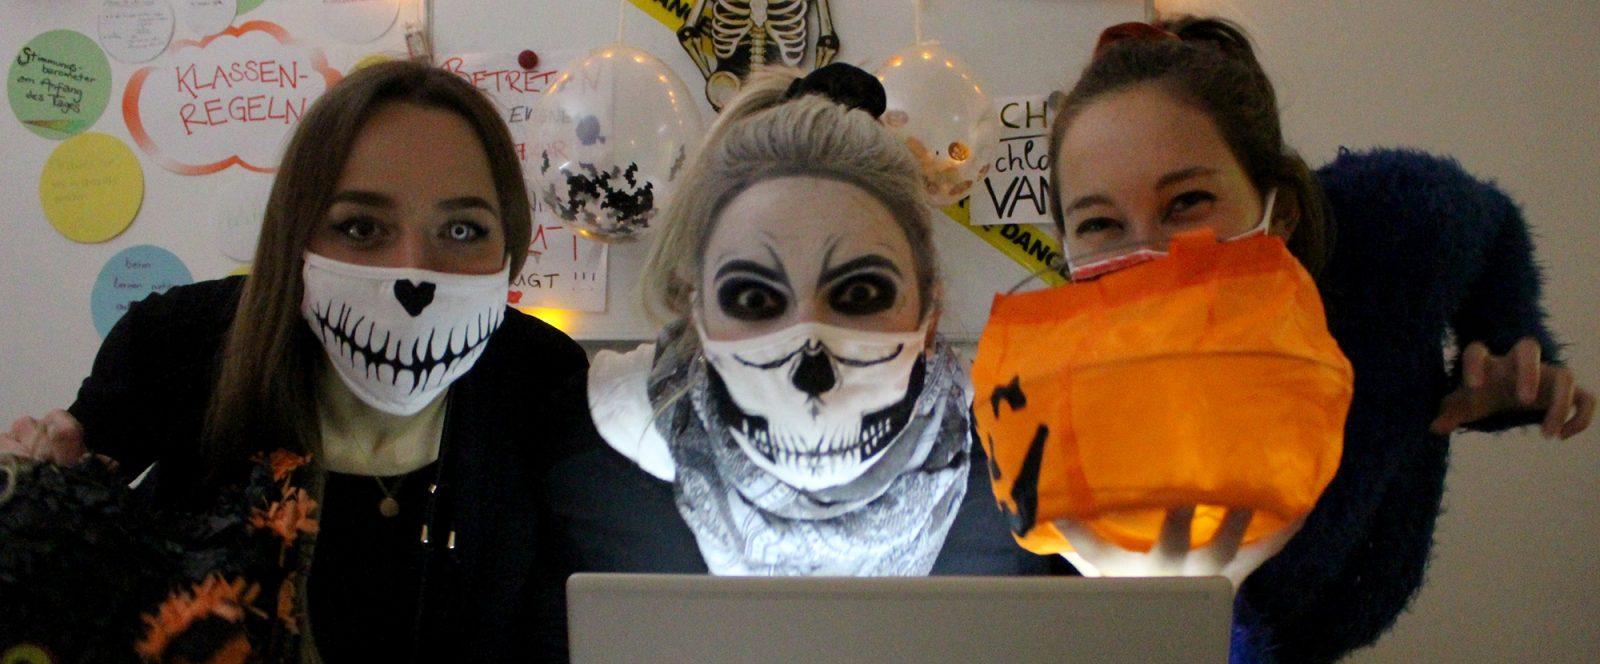 Halloweenparty über Skype